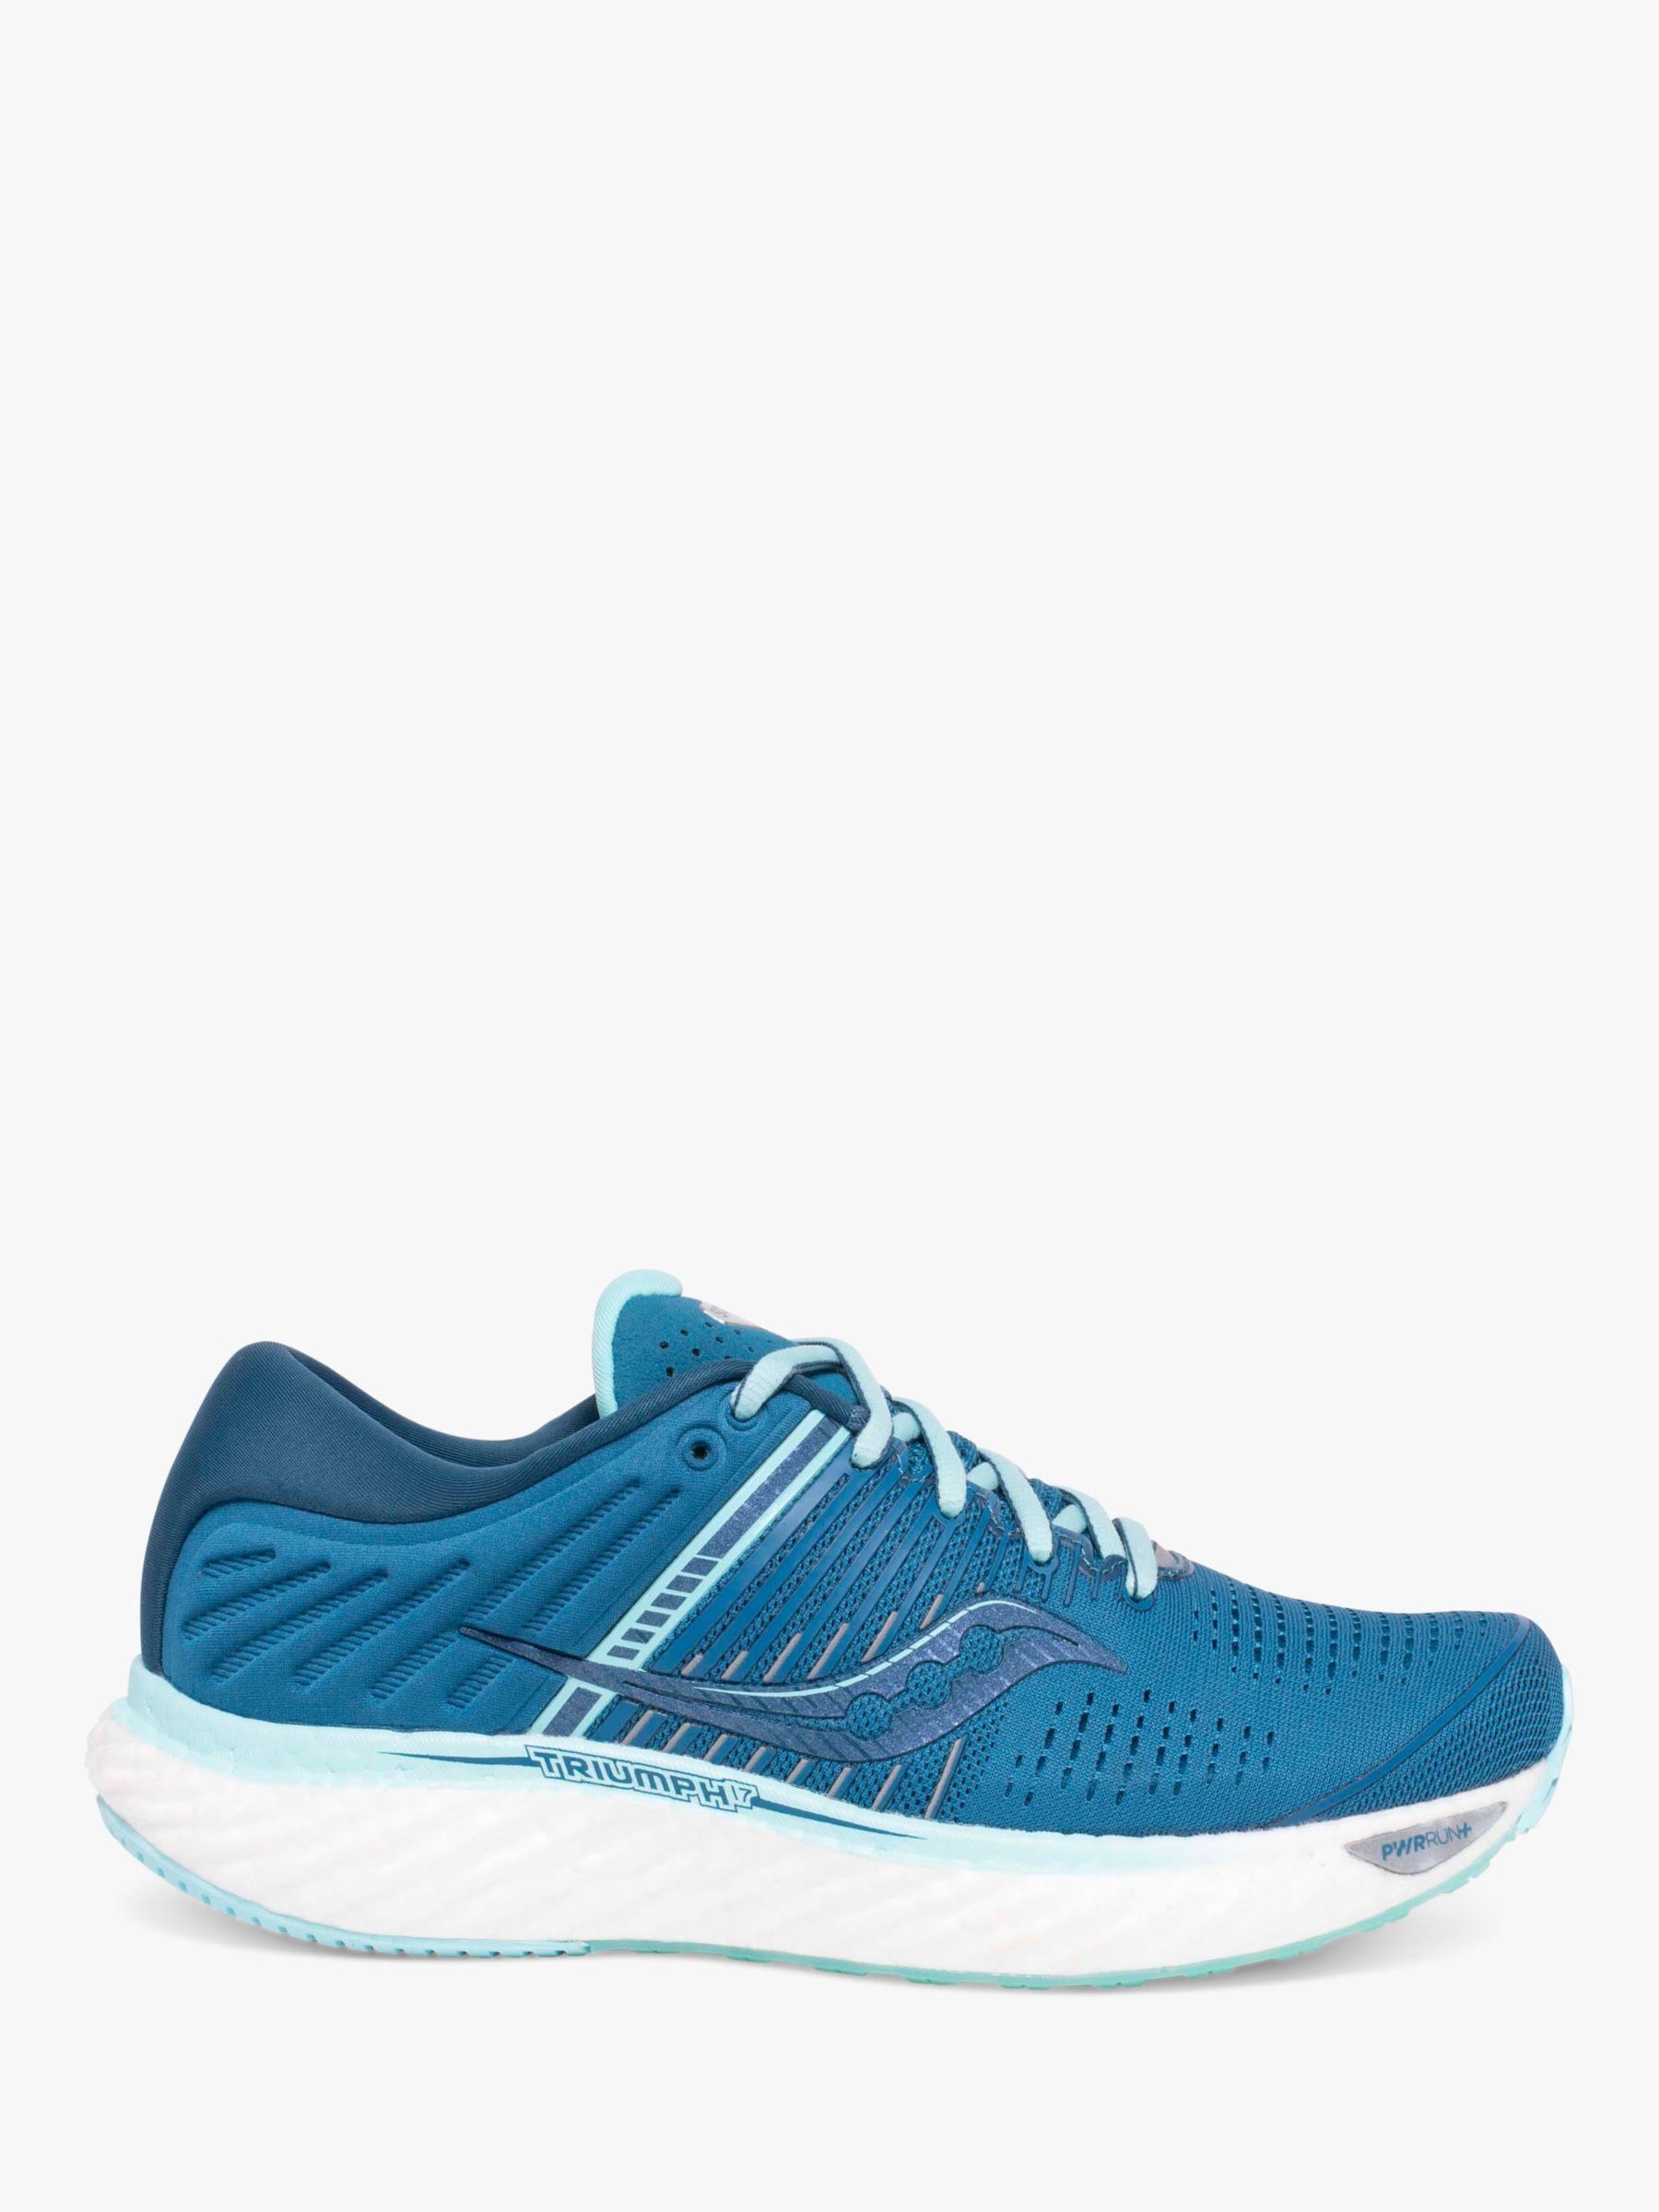 Saucony Saucony Triumph 17 Women's Running Shoes, Aqua Blue